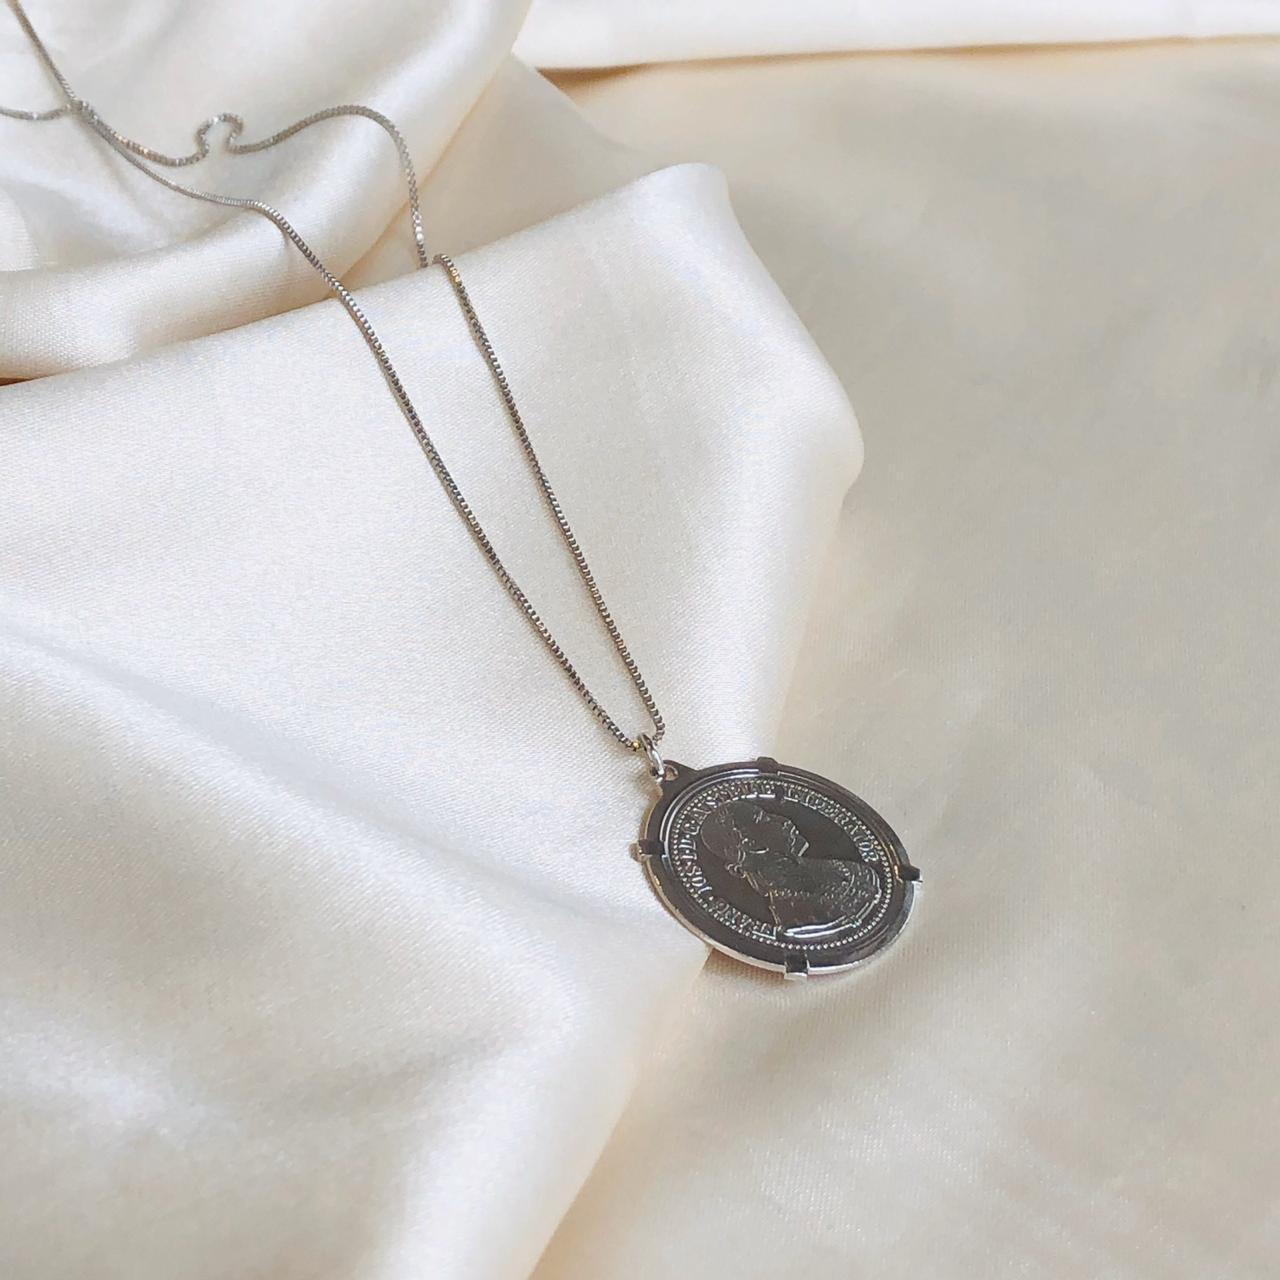 Colar Medalha Moeda Banhada em Ródio Branco